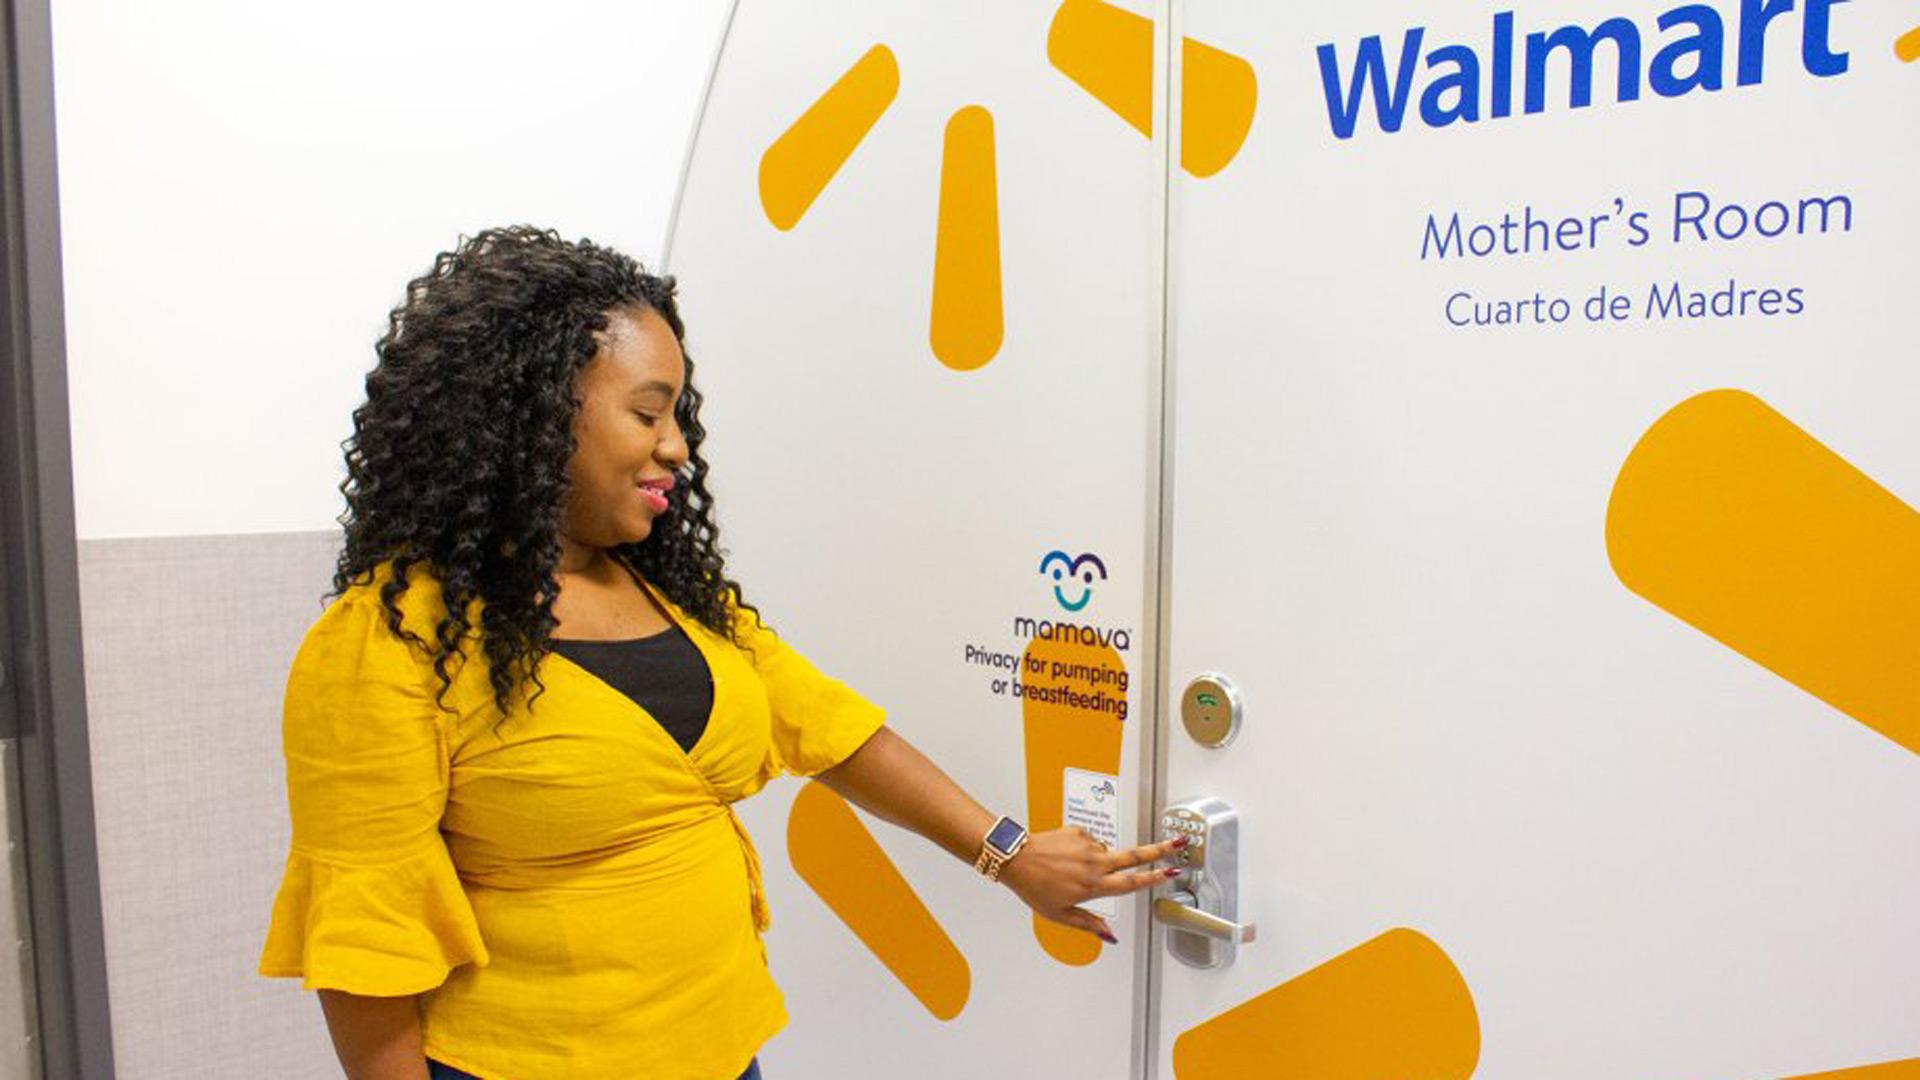 Walmart To Add Breastfeeding Pods For Nursing Mothers In 100 U S Stores Ktla